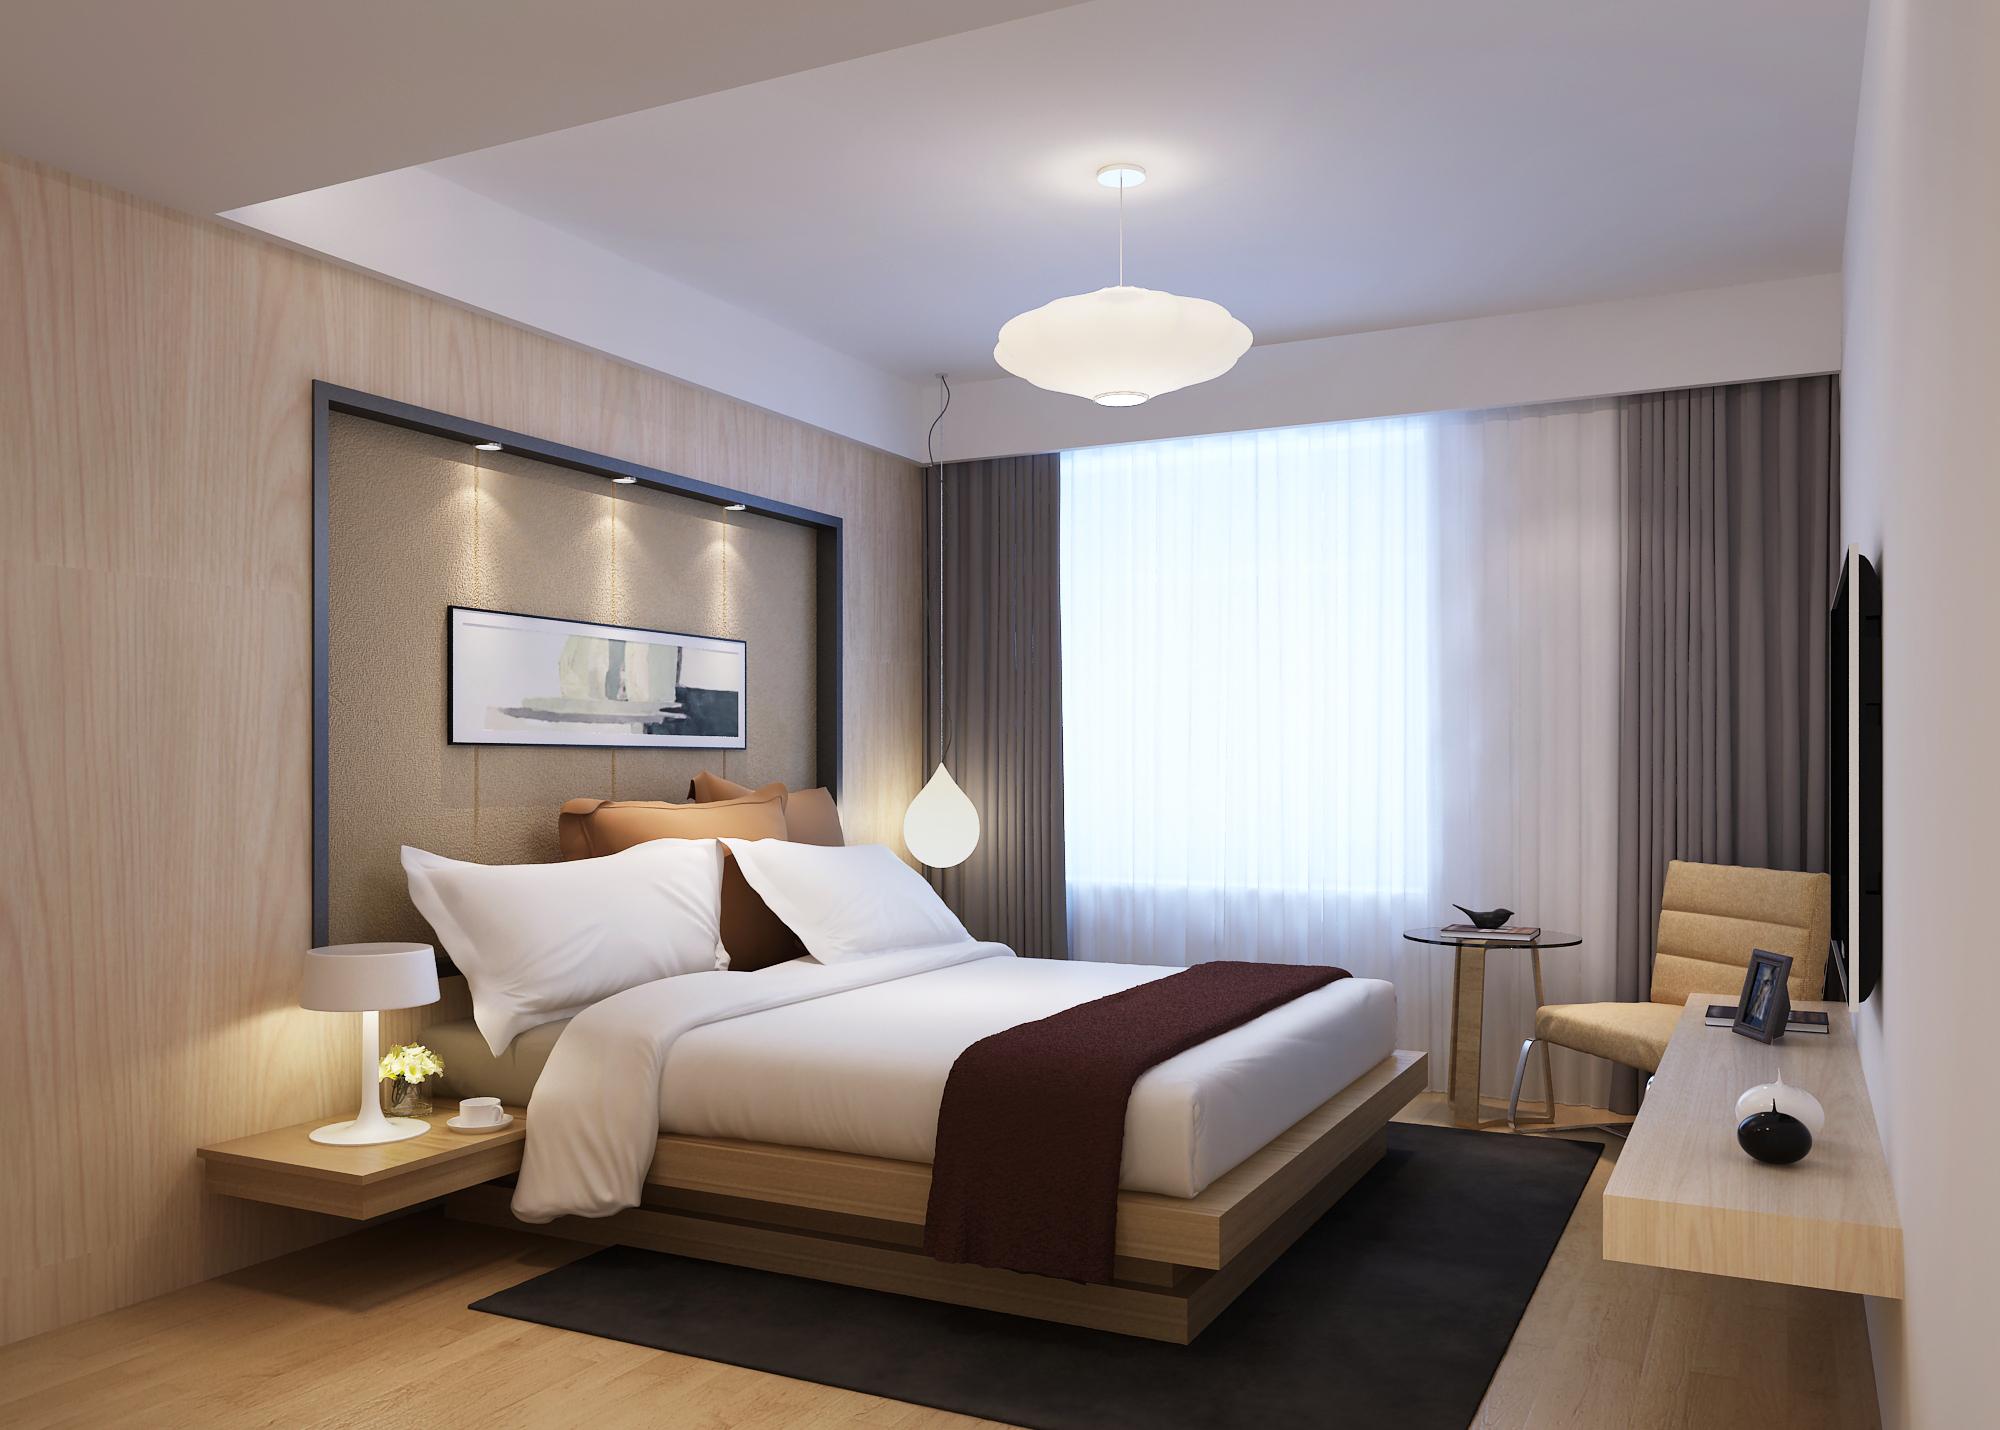 Modern Bedroom 3D Model MAX | CGTrader.com on Bedroom Models  id=33570